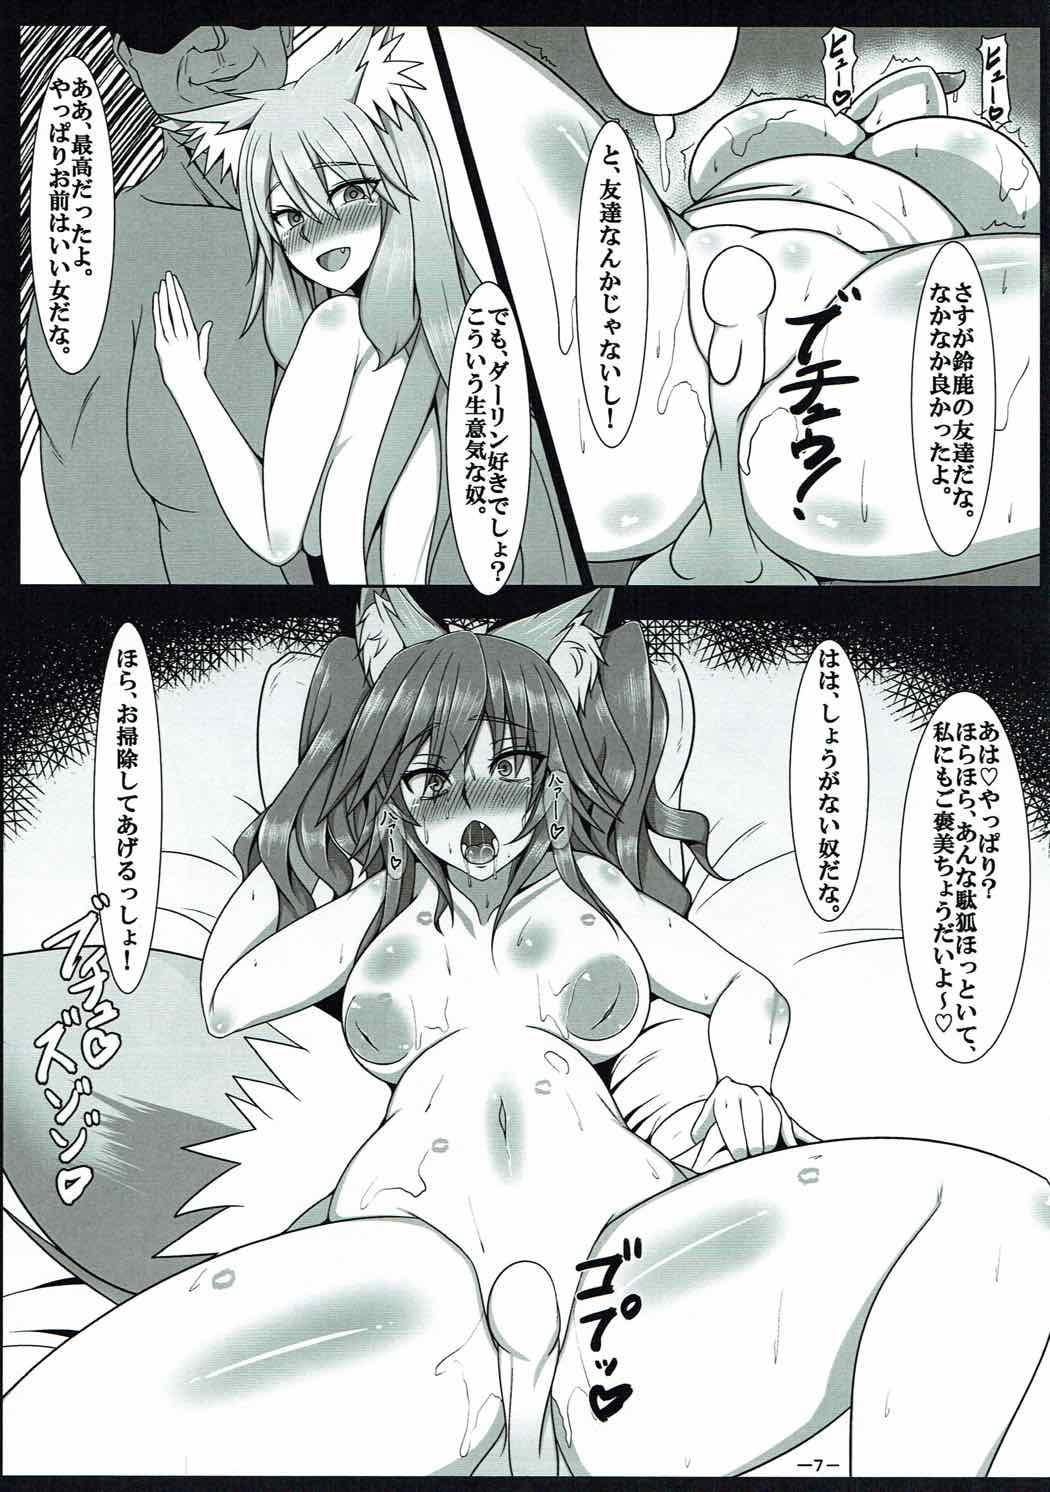 RECARO GIRLS Vol. 1 7